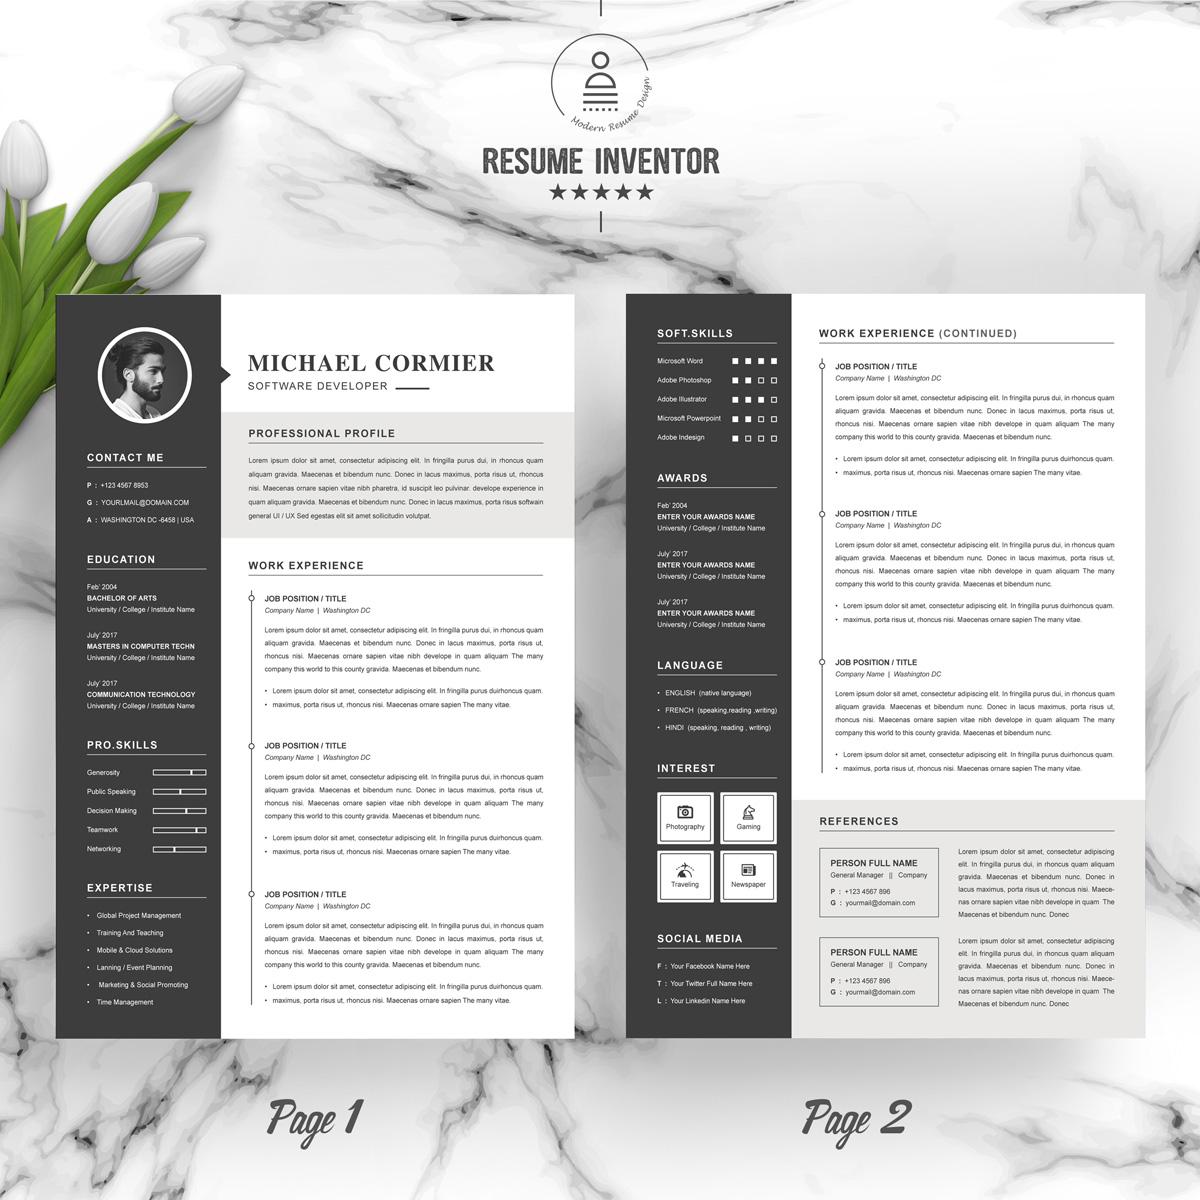 https://s3u.tmimgcdn.com/1860567-1561008937306_02_2-Pages-Free-Resume-Design-Template.jpg